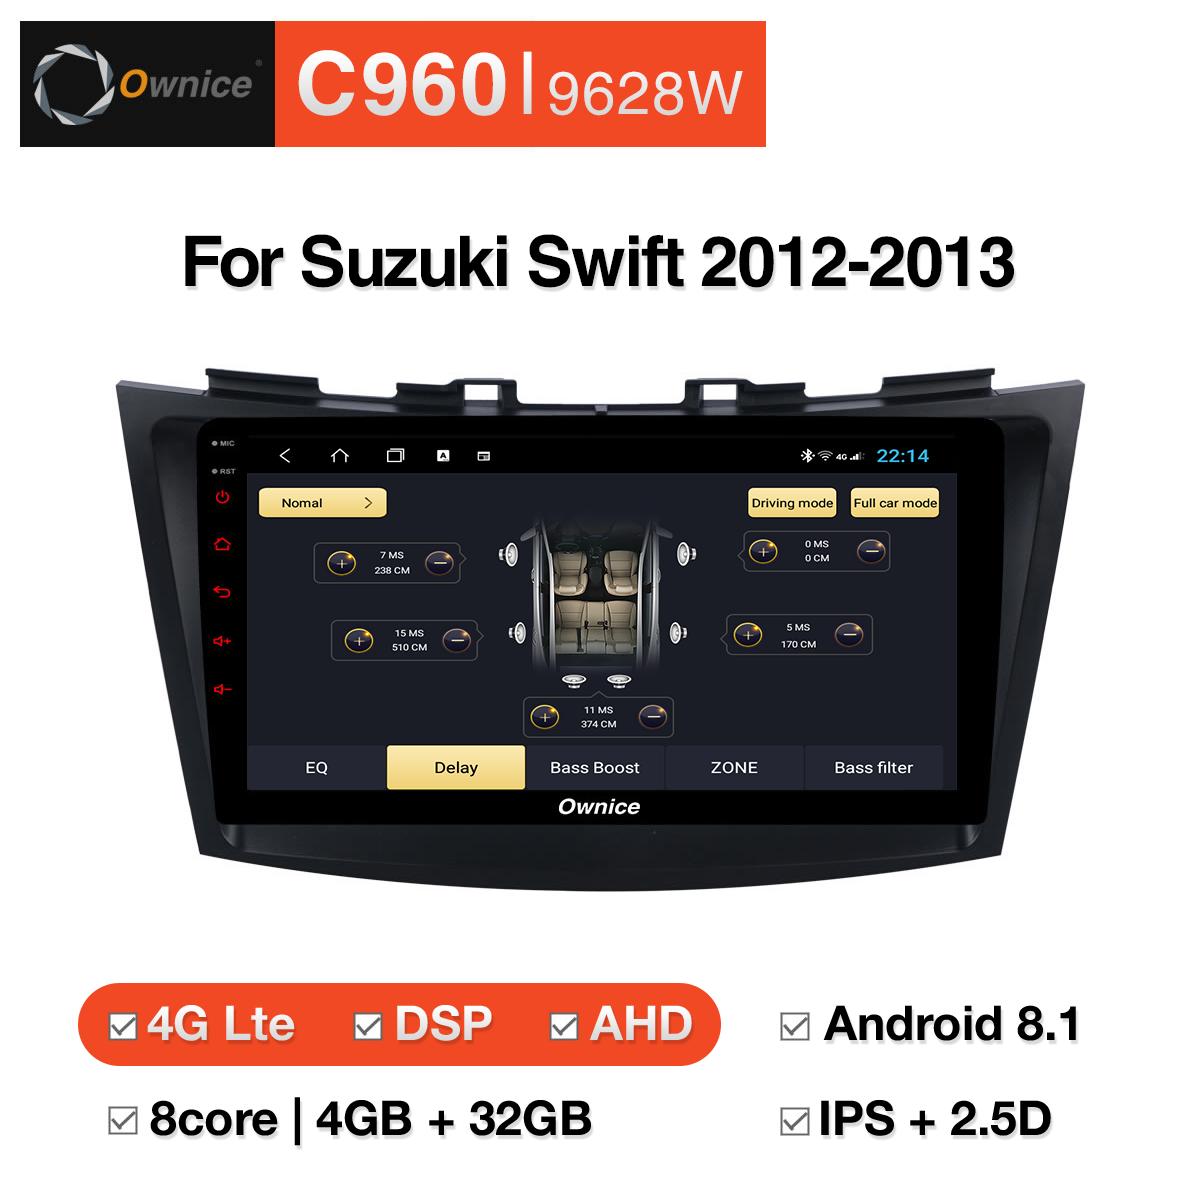 Đầu DVD android Ownice C960 cho xe ô tô Suzuki Swift 2012-2013:: OL-9628W